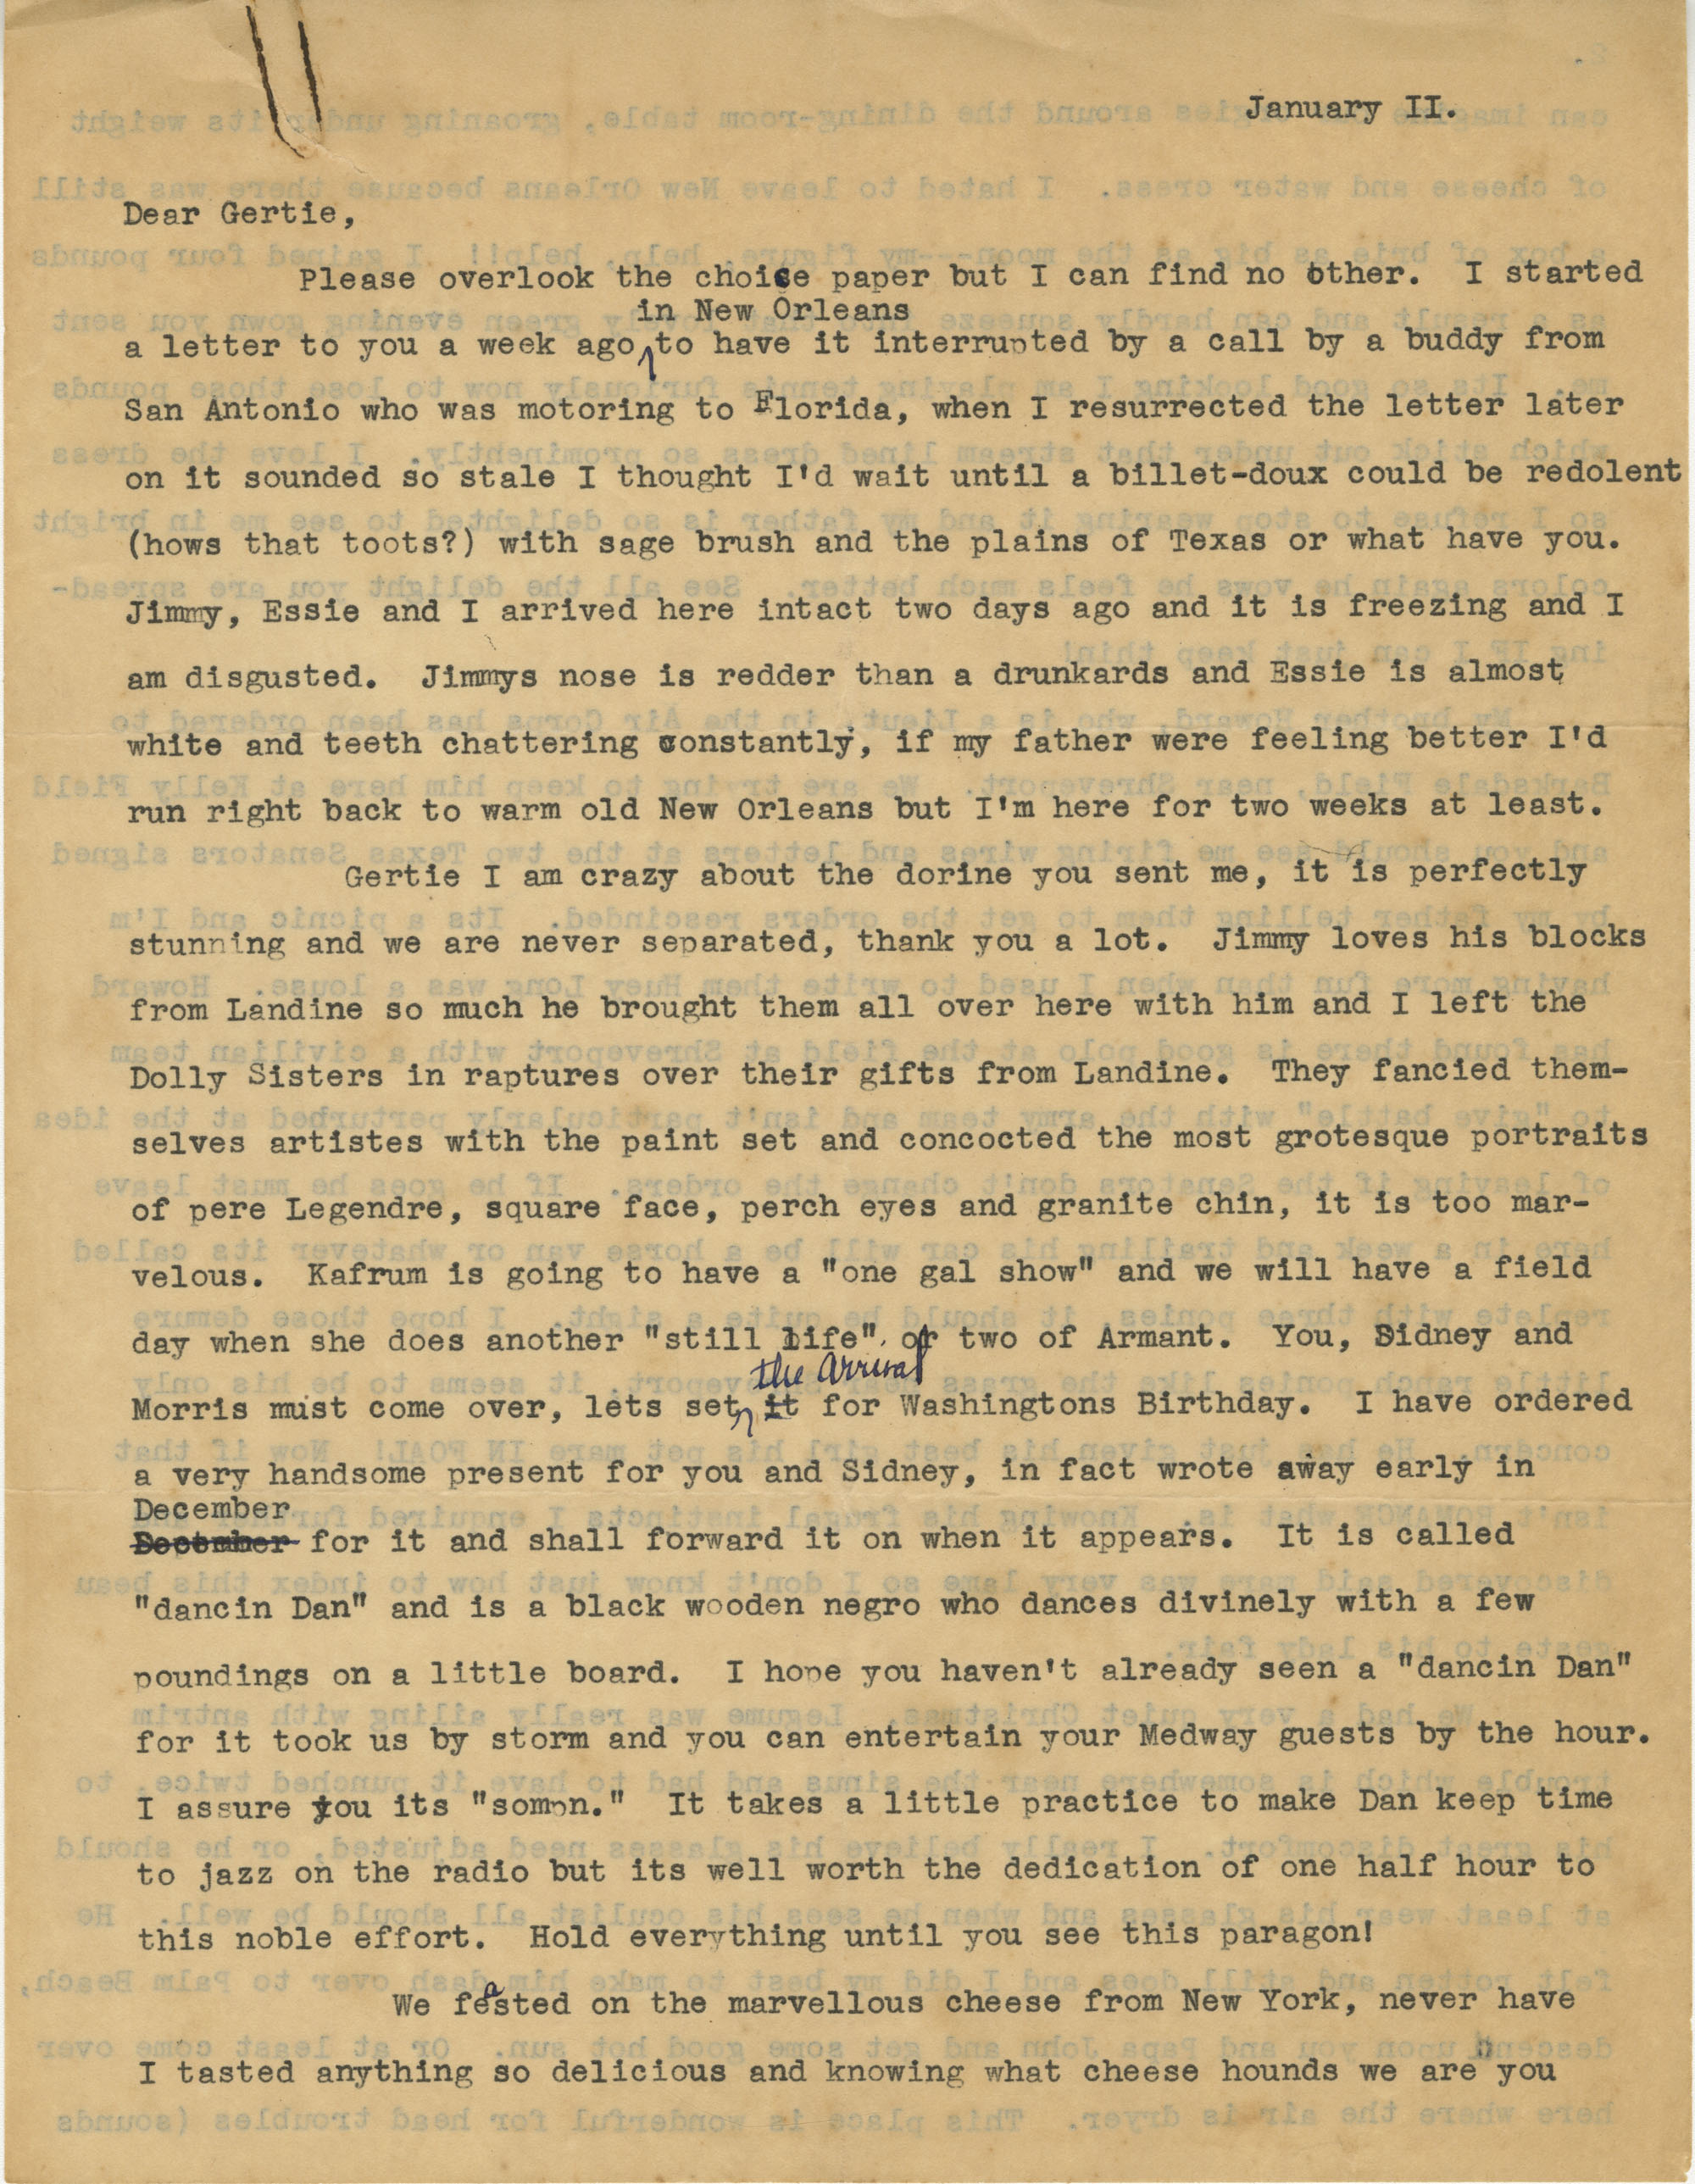 Letter from Olive Legendre, January 11, 1938